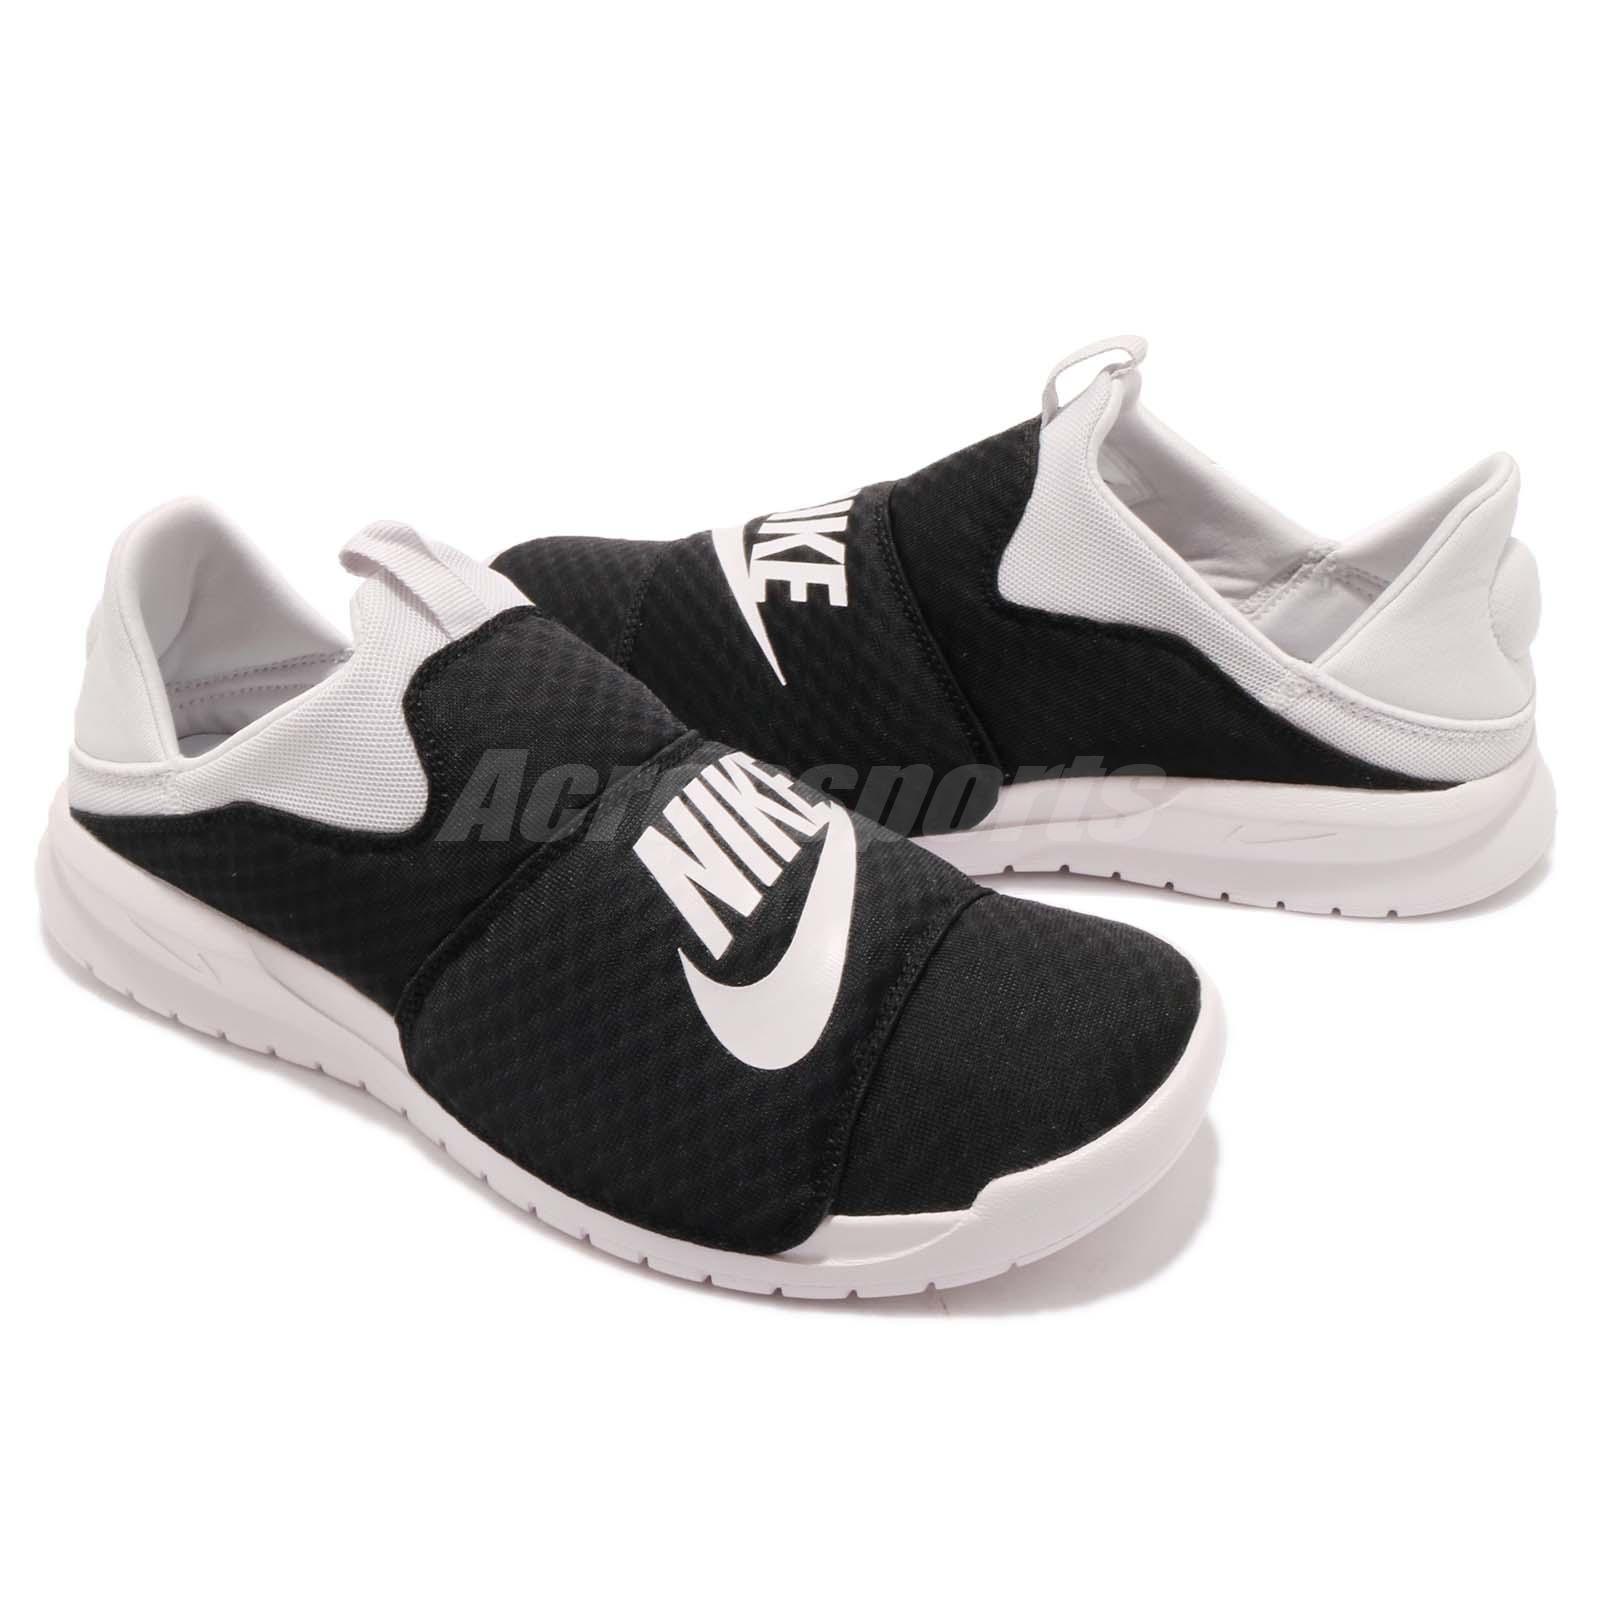 16c85ef78 Nike Benassi SLP Slip On Black Vast Grey Men Women Shoes Sneakers ...